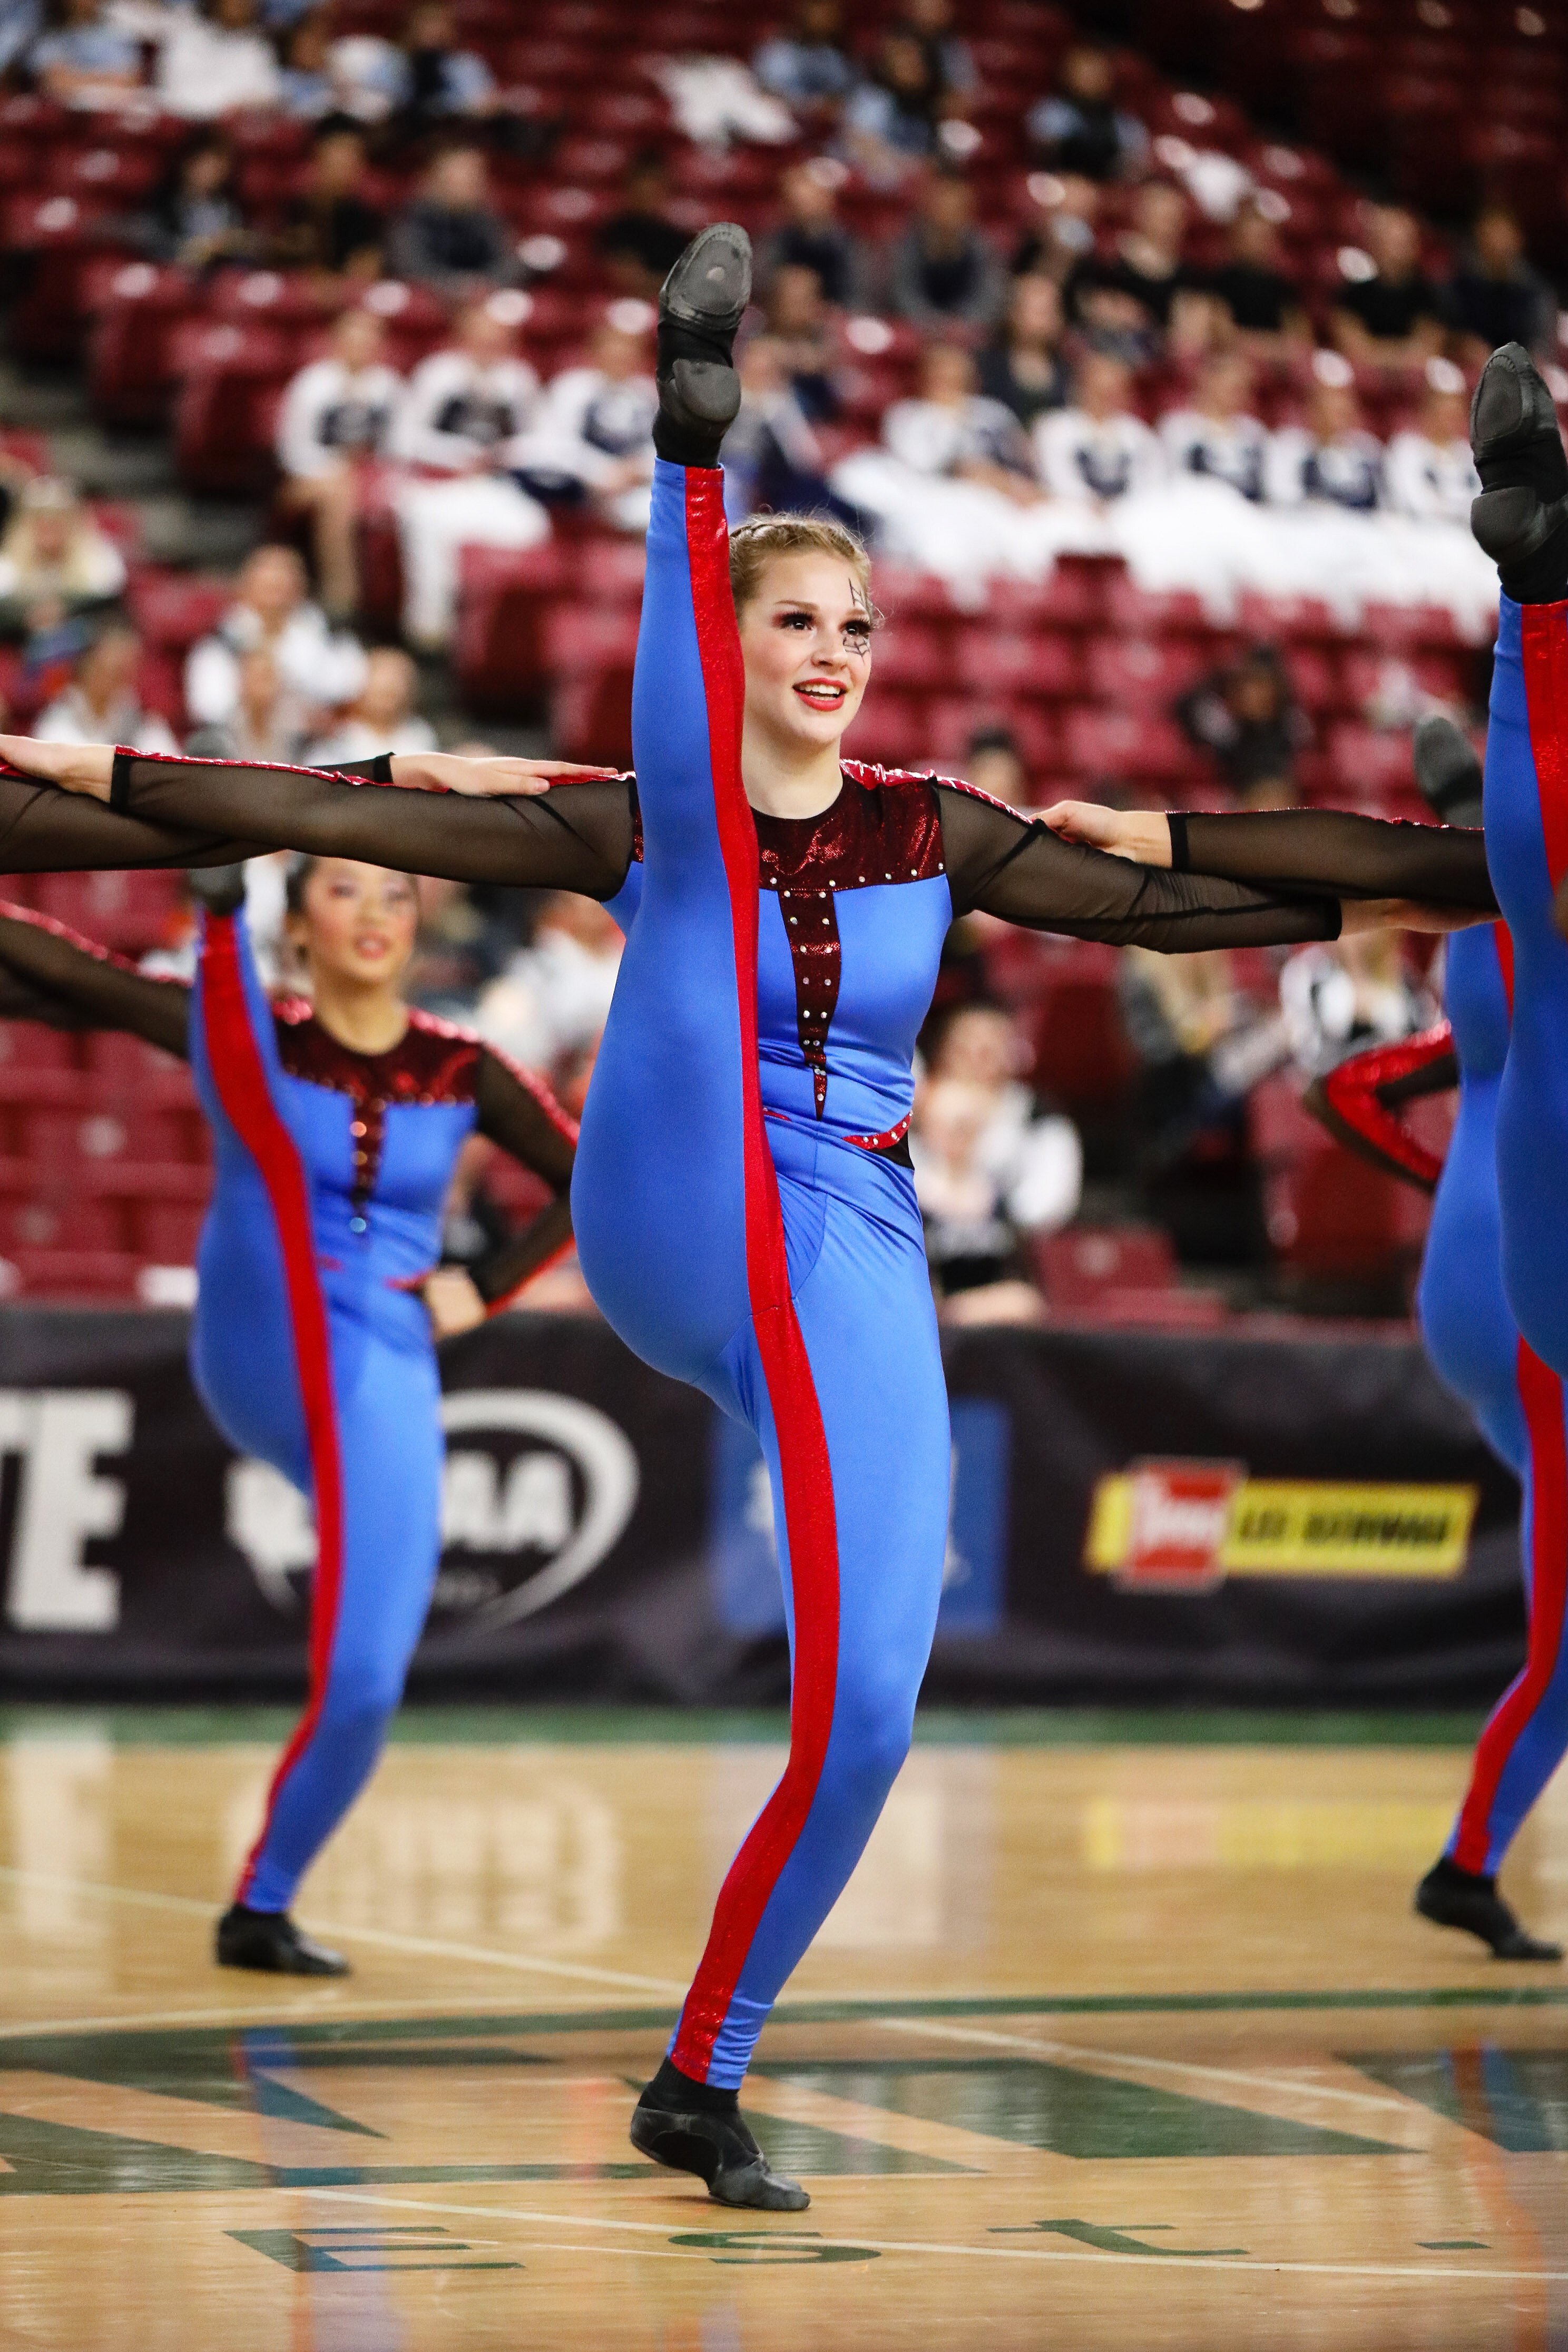 washington dance teams custom dance costumes